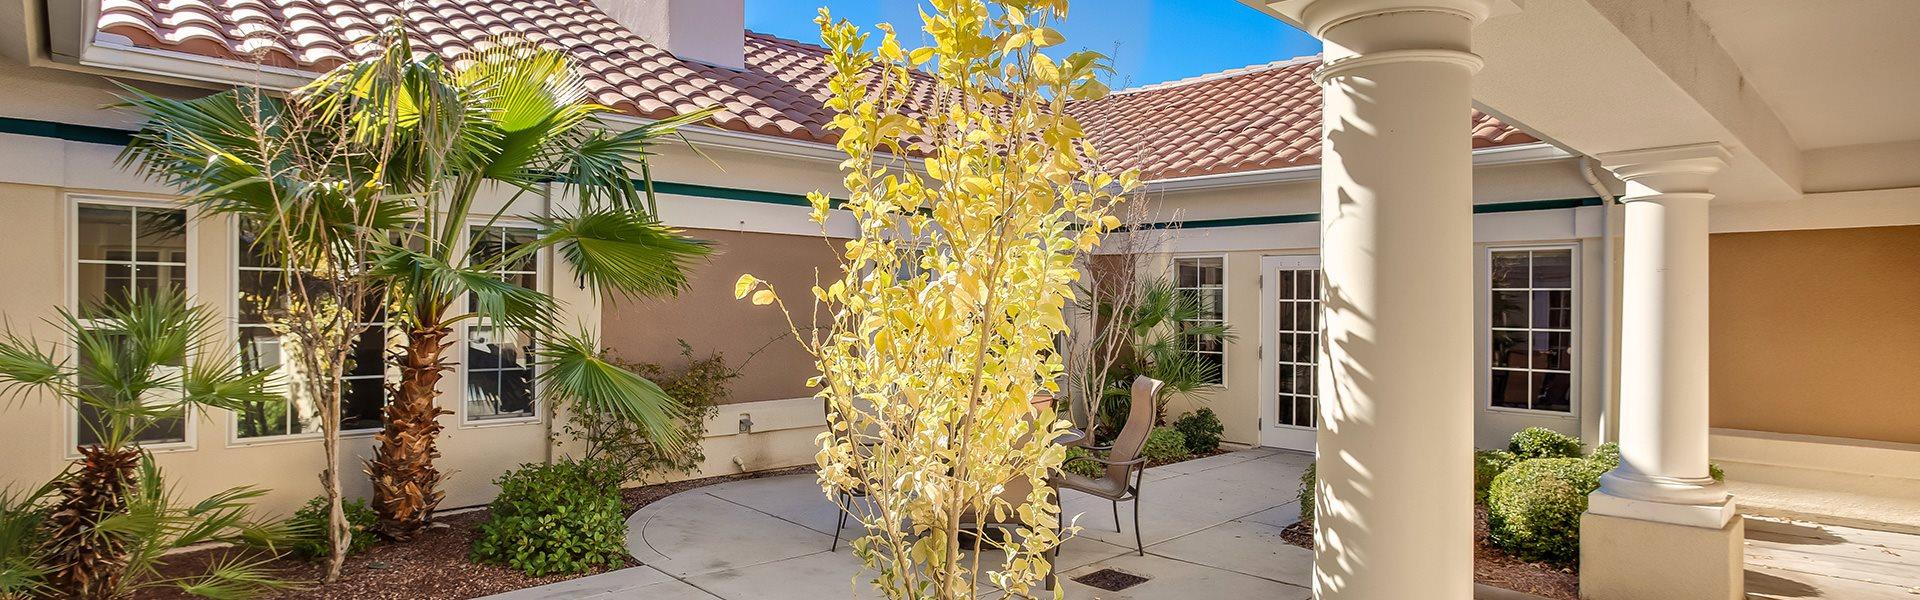 Beautiful Courtyard at Pacifica Senior Living Spring Valley, Las Vegas, 89147